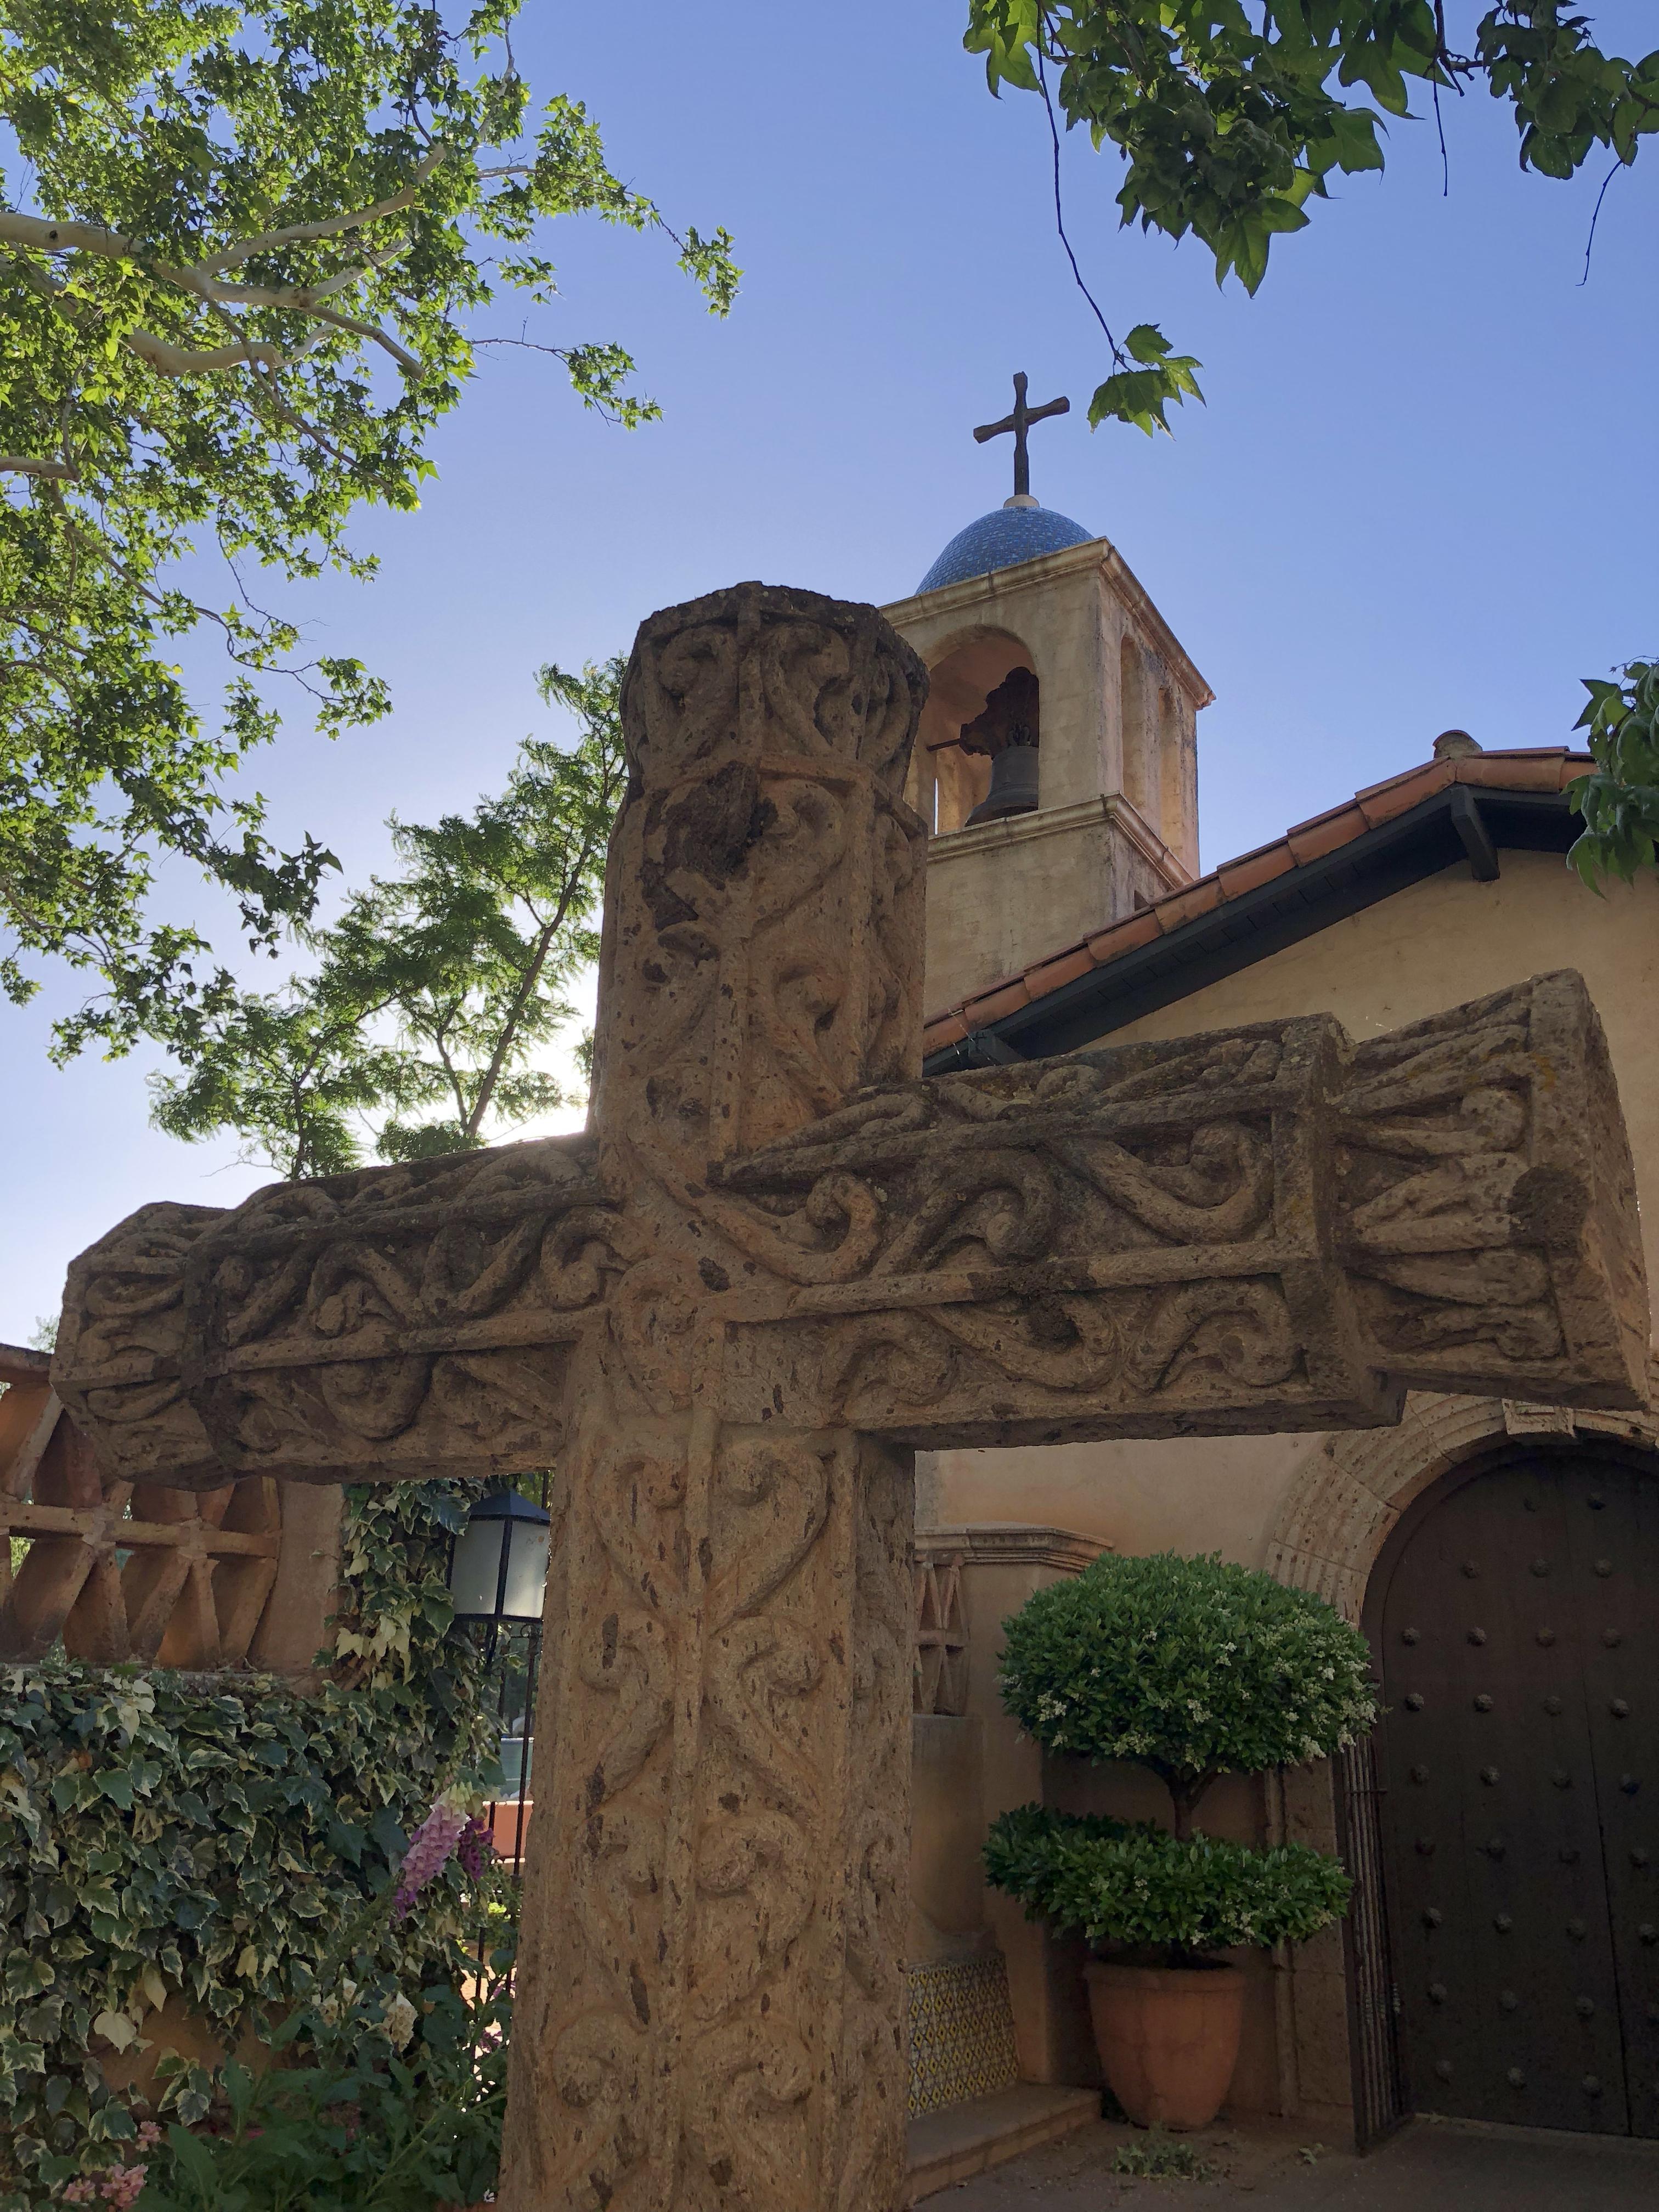 The chapel at Tlaquepaque Arts and Crafts Village